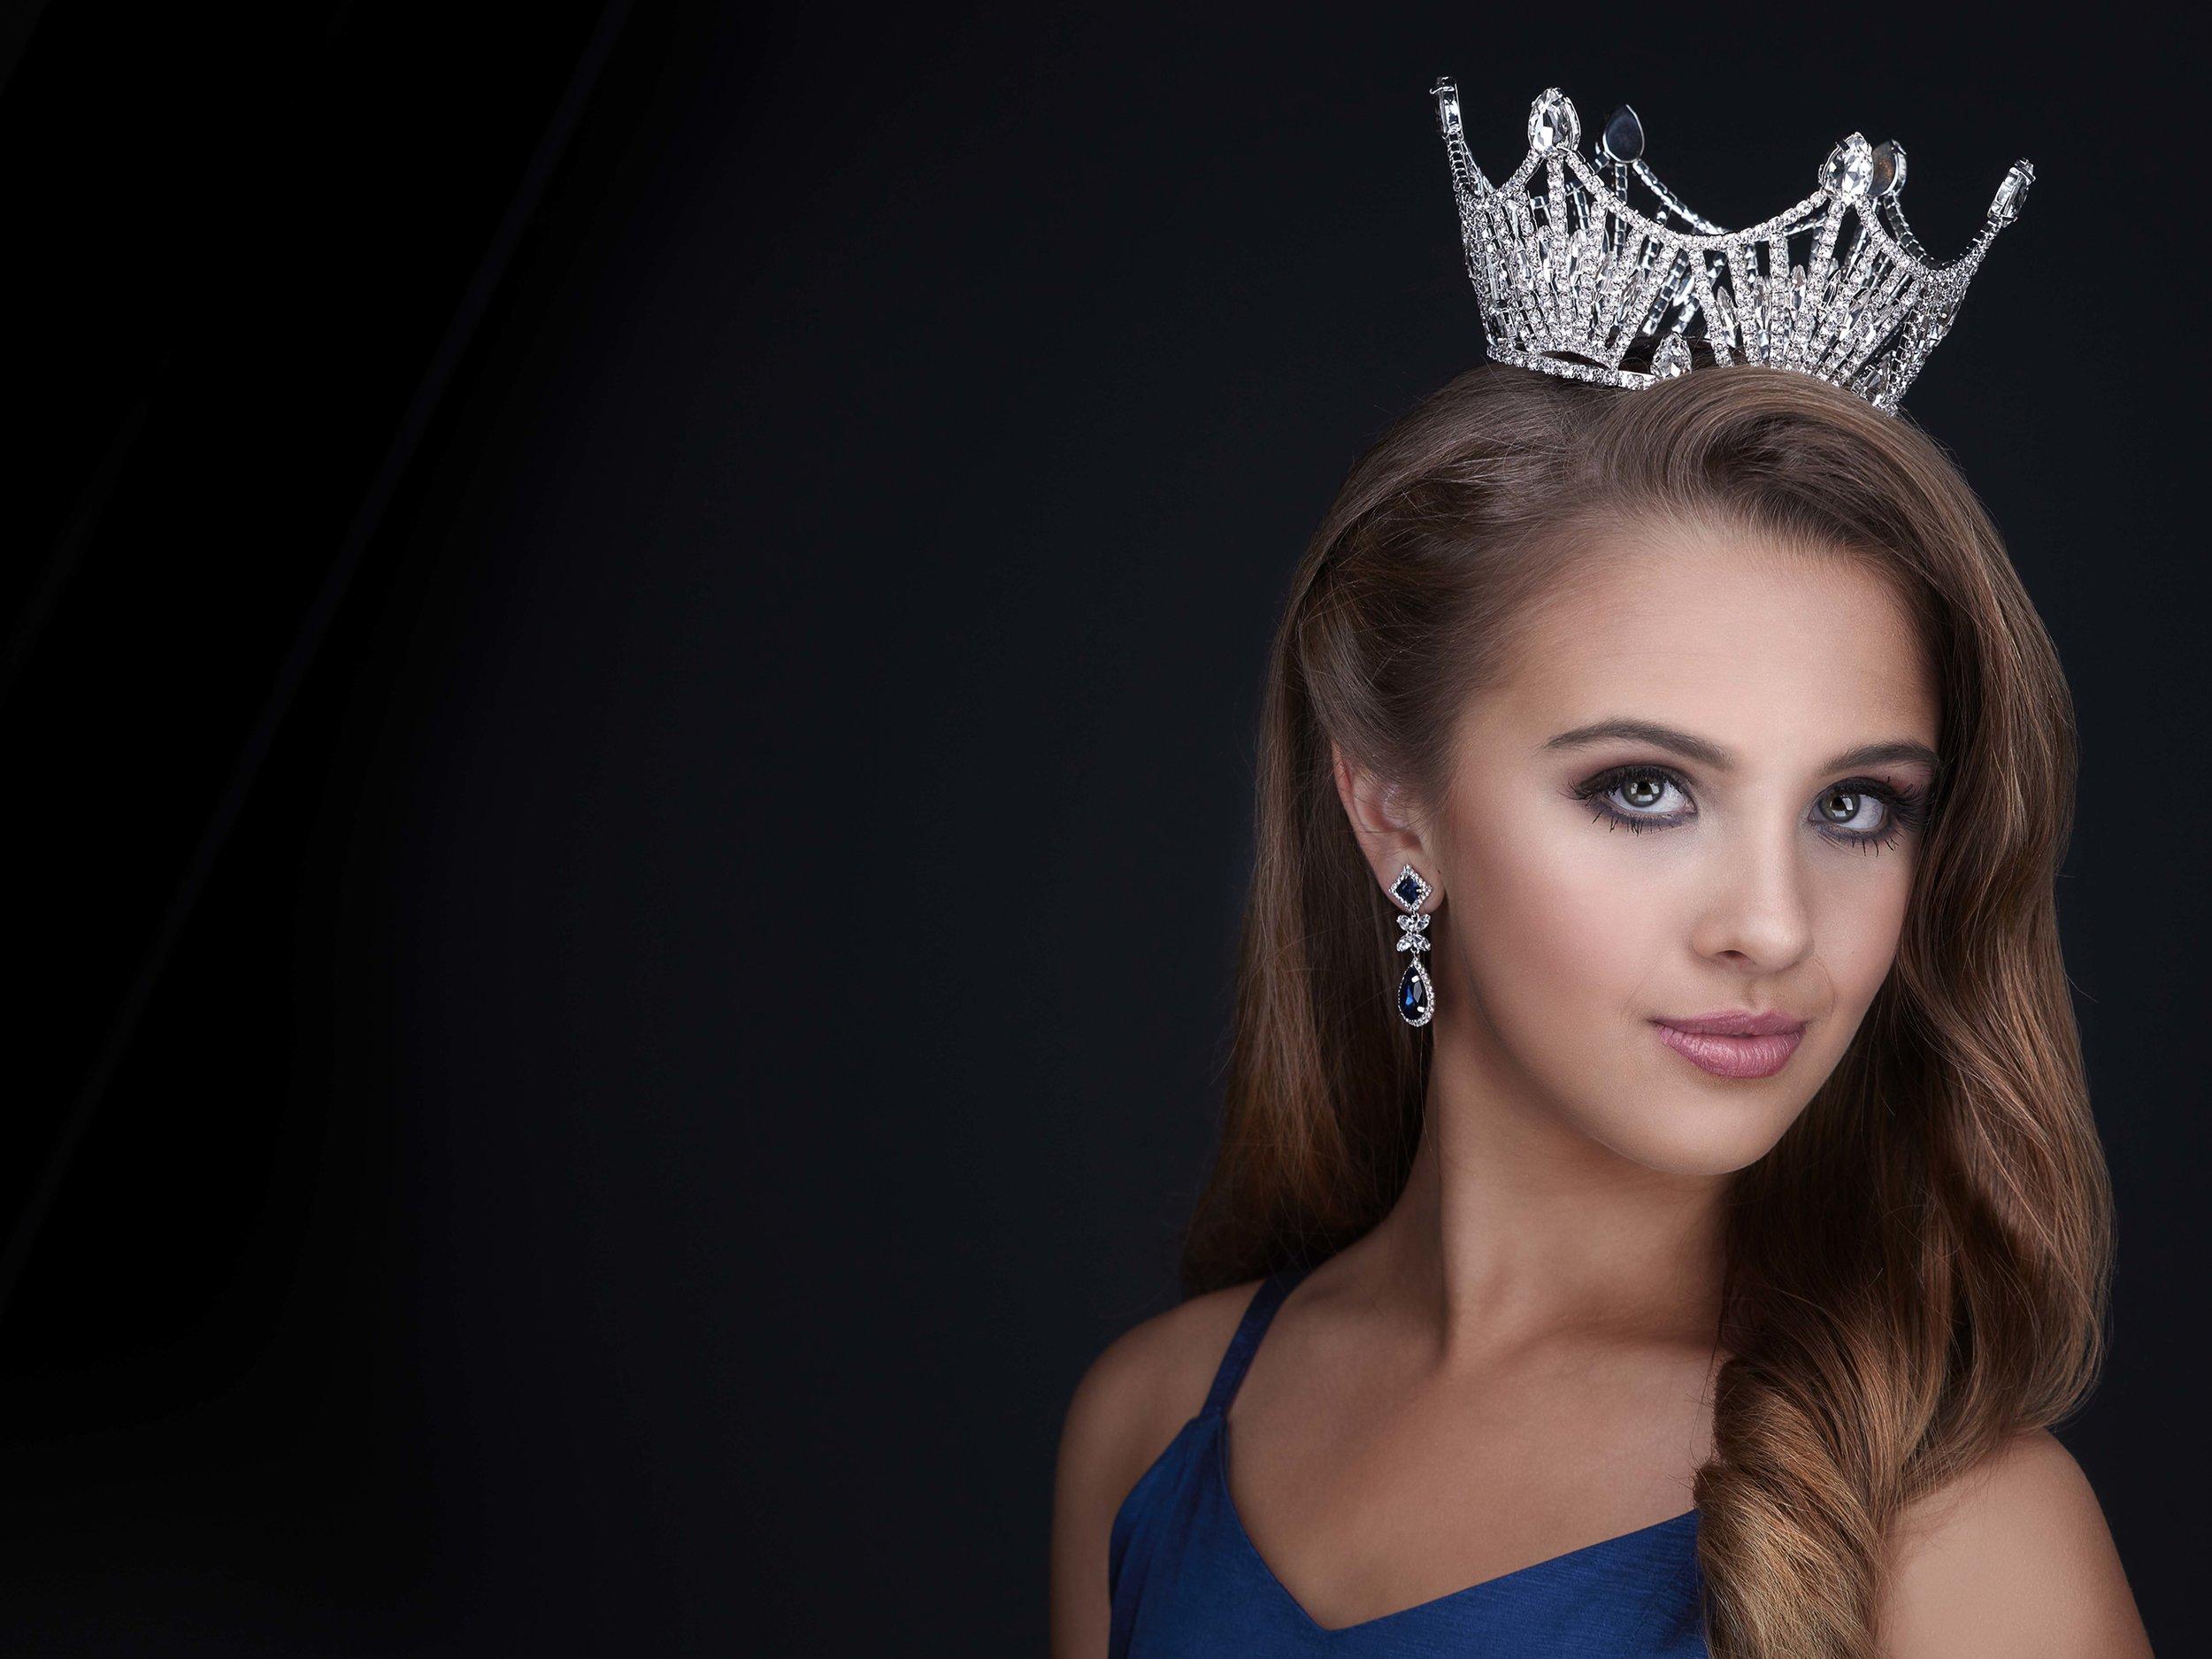 Pageant_crown_headshot_addie_rose_jodie_kelly_photography_central_arkansas.jpg